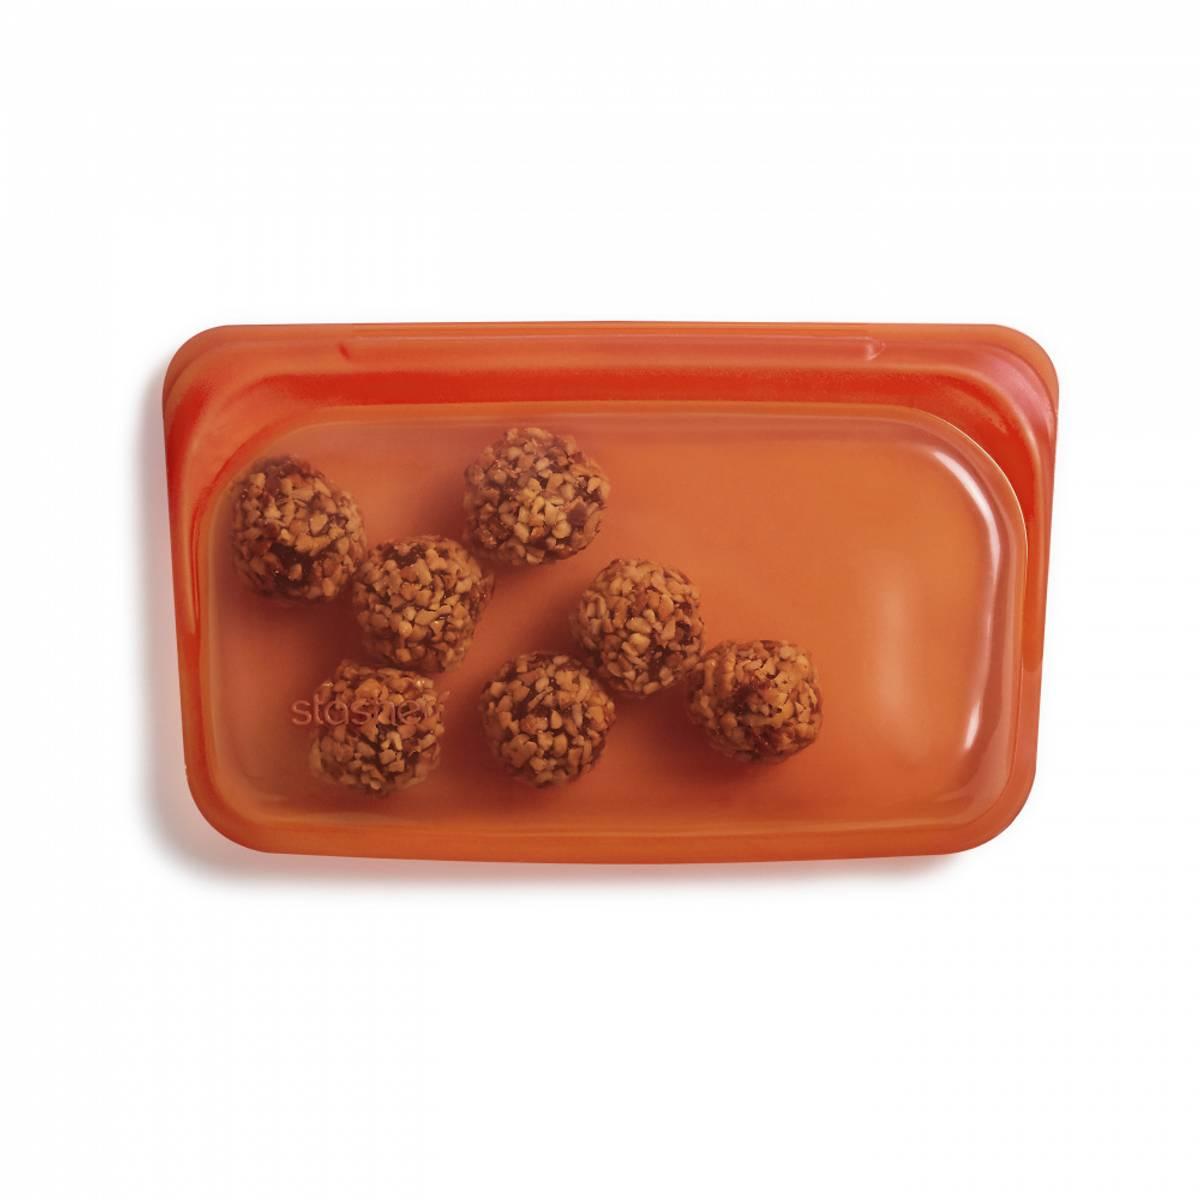 Stasher Snack, Citrus / Stasher Bags